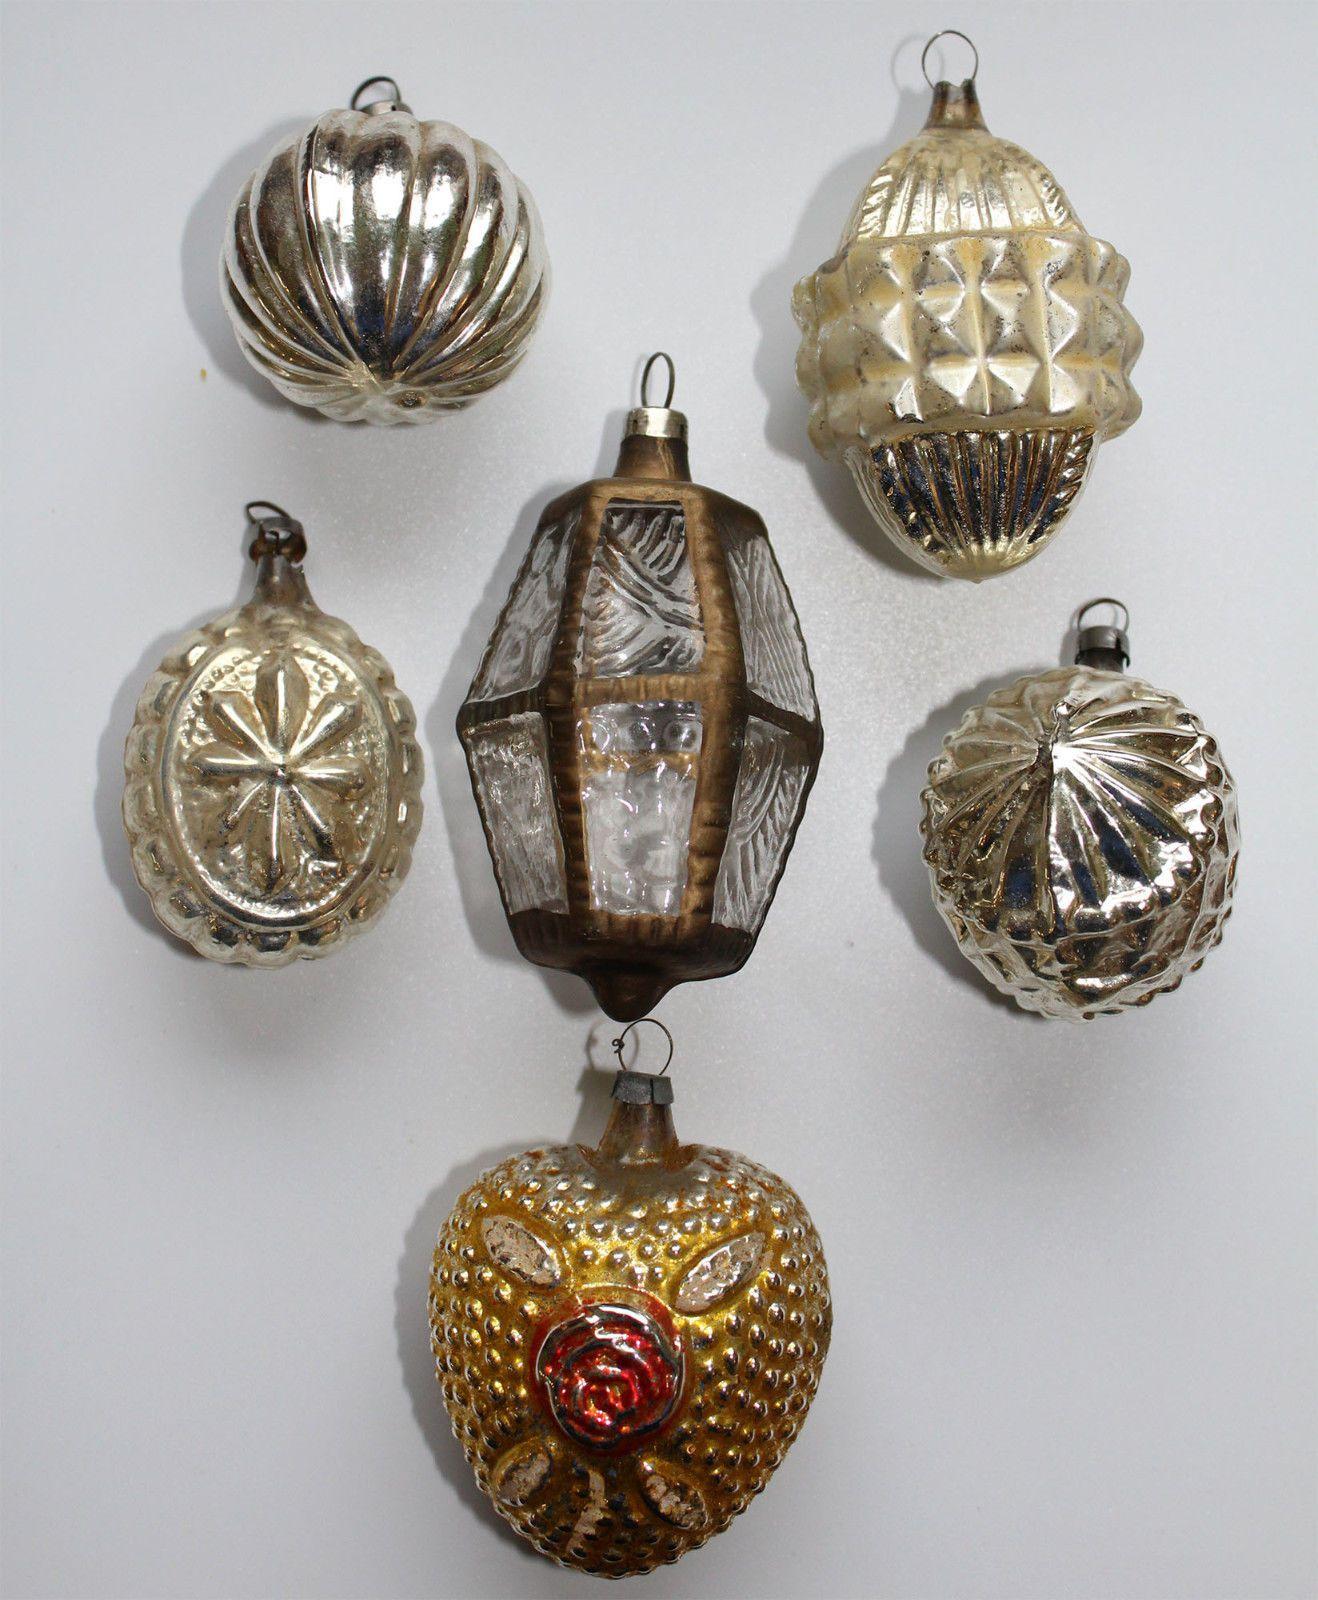 Alte Christbaumkugel, Laterne Lampion, Baumschmuck Um 1900 - Ebay Glass